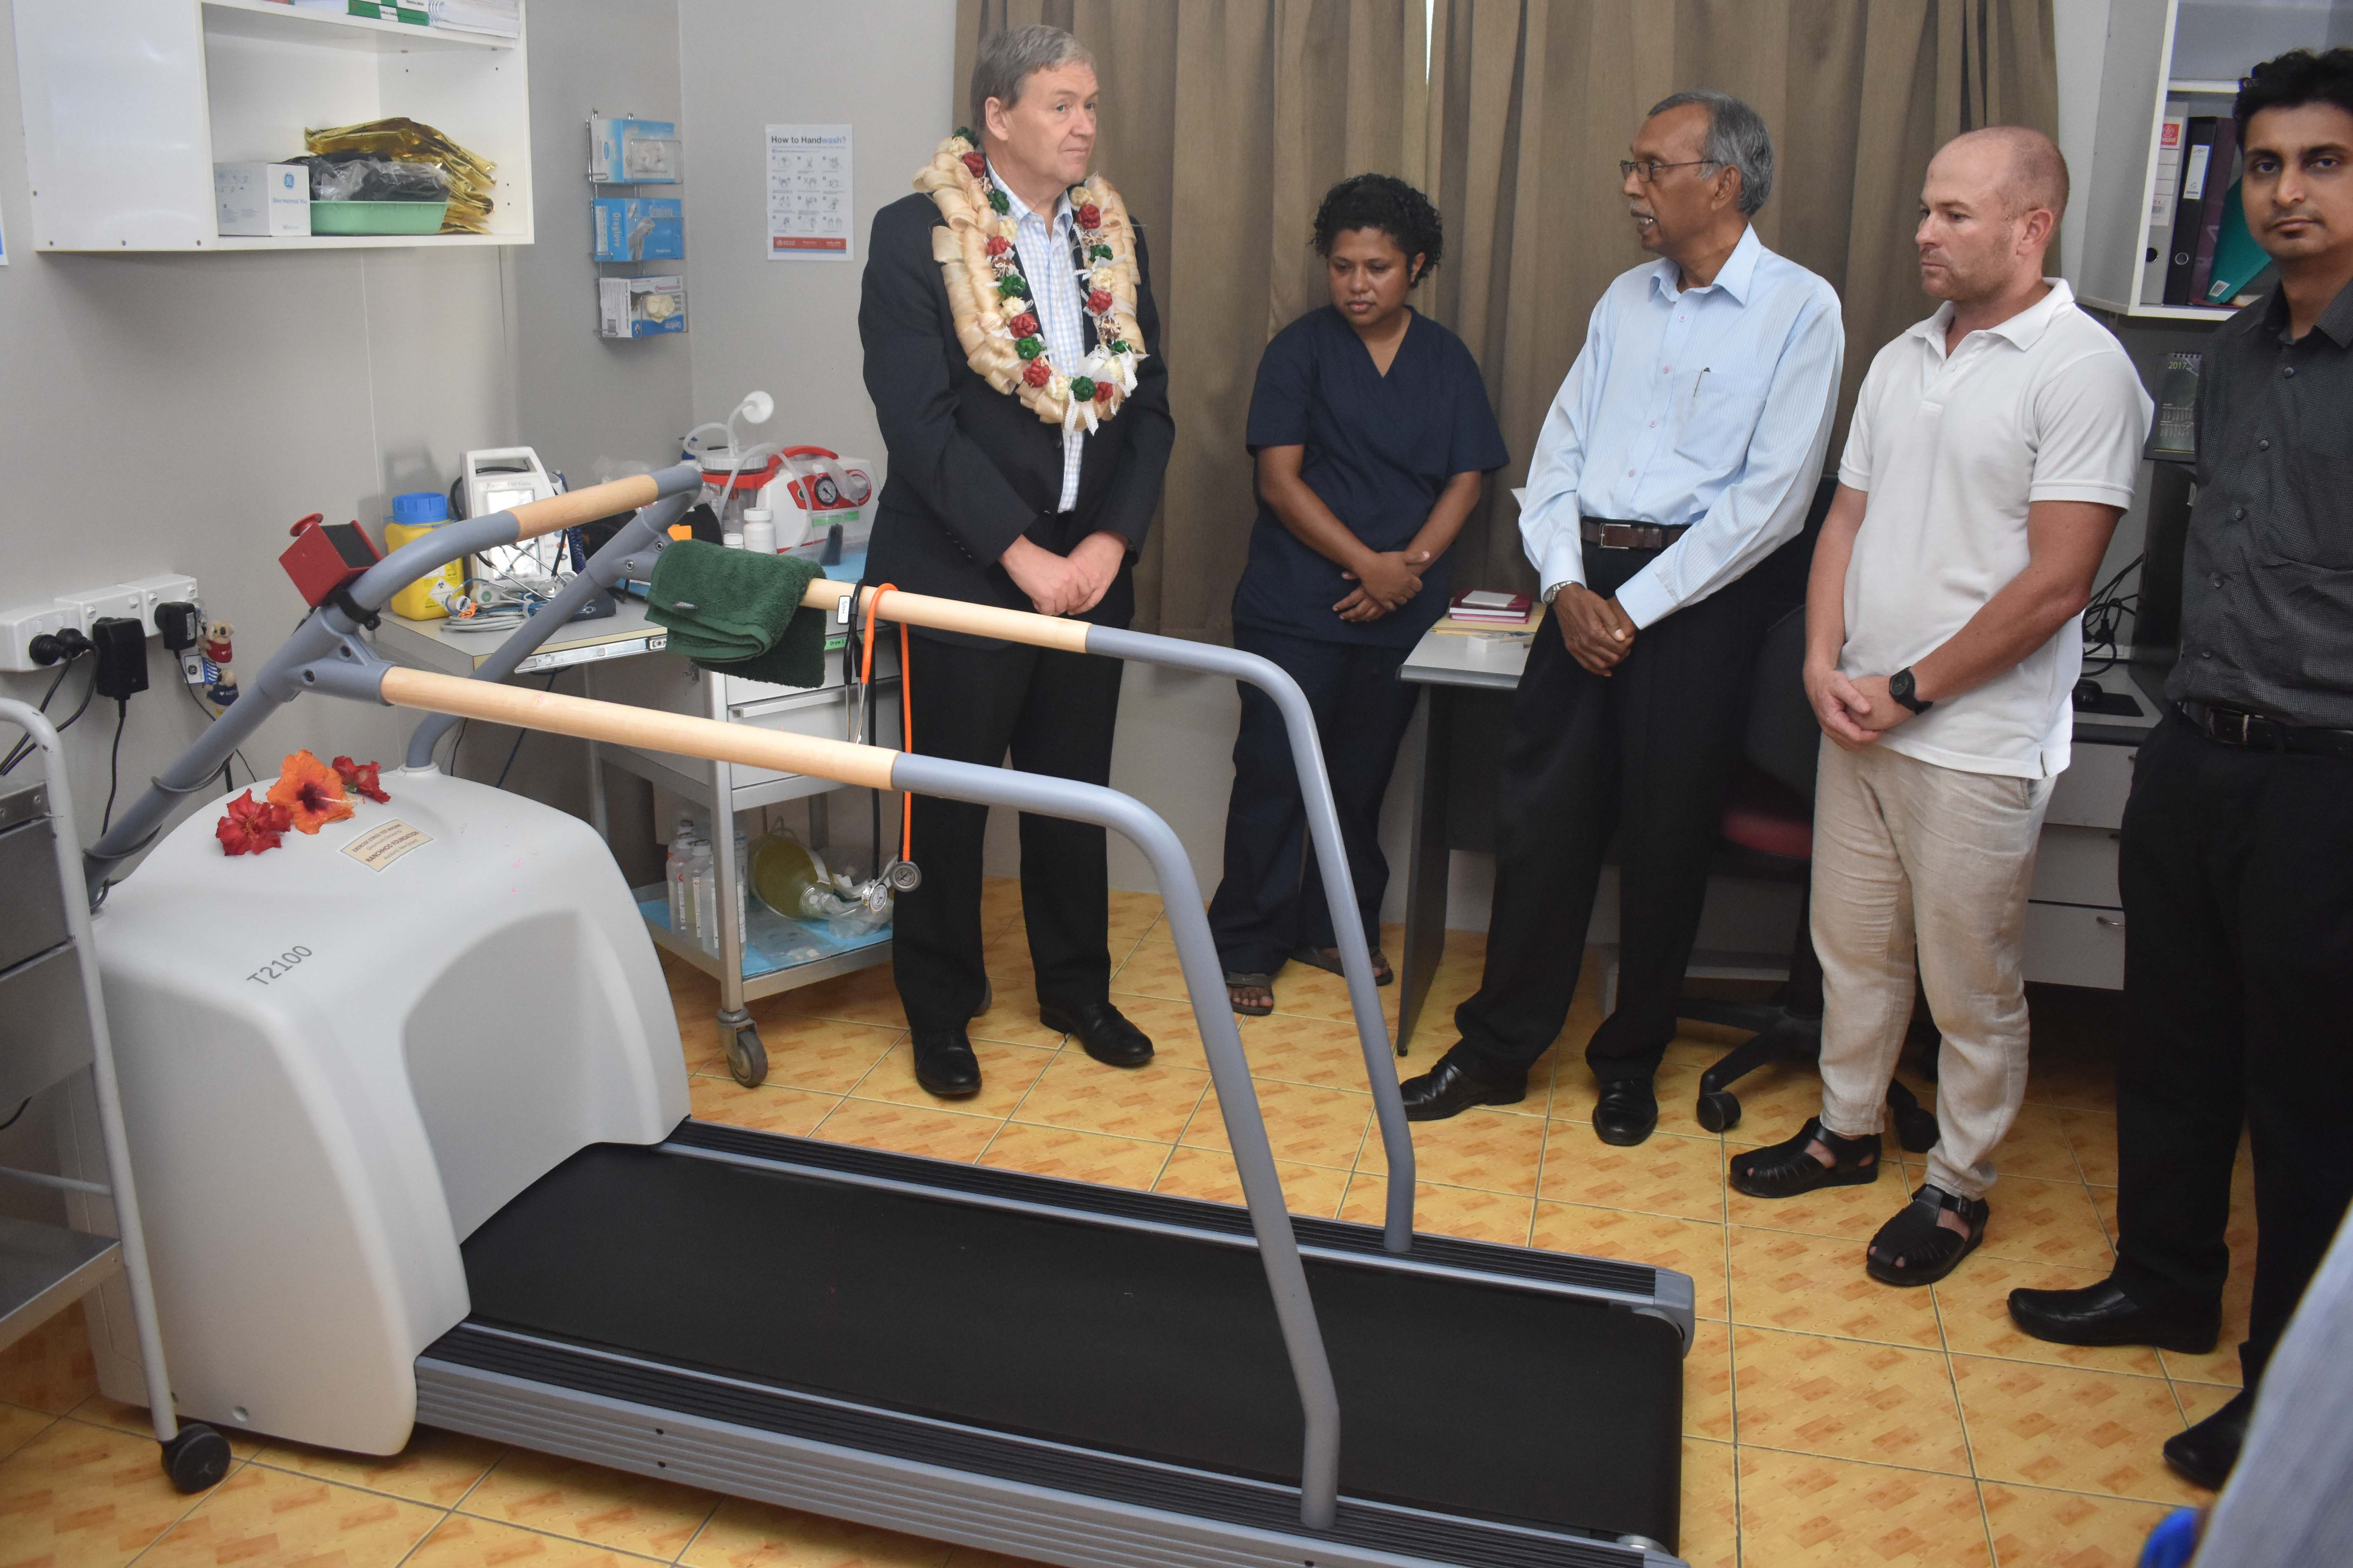 Ministry of Health and Medical Services Permanent Secretary Philip Davis (with garland) at the Sarada Medical Centre, Ashram Road, in Nadi on July 19, 2017. Photo: Waisea Nasokia